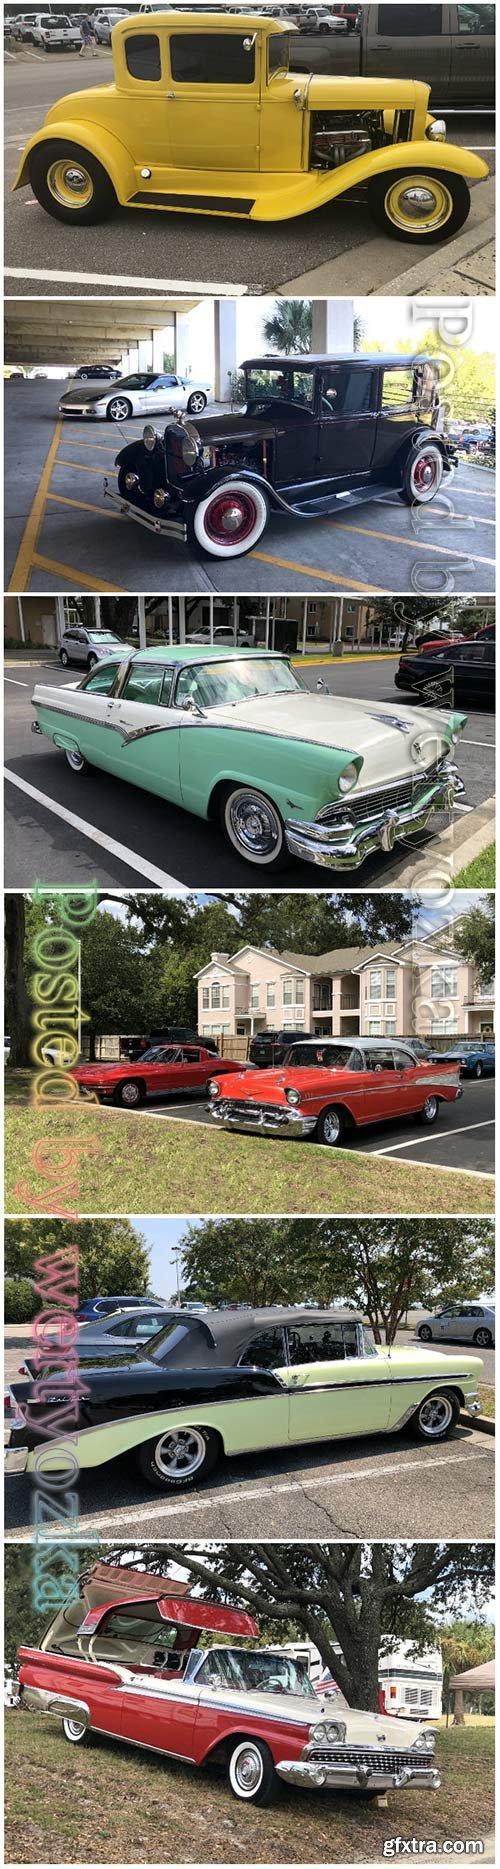 Vintage car beautiful stock photo